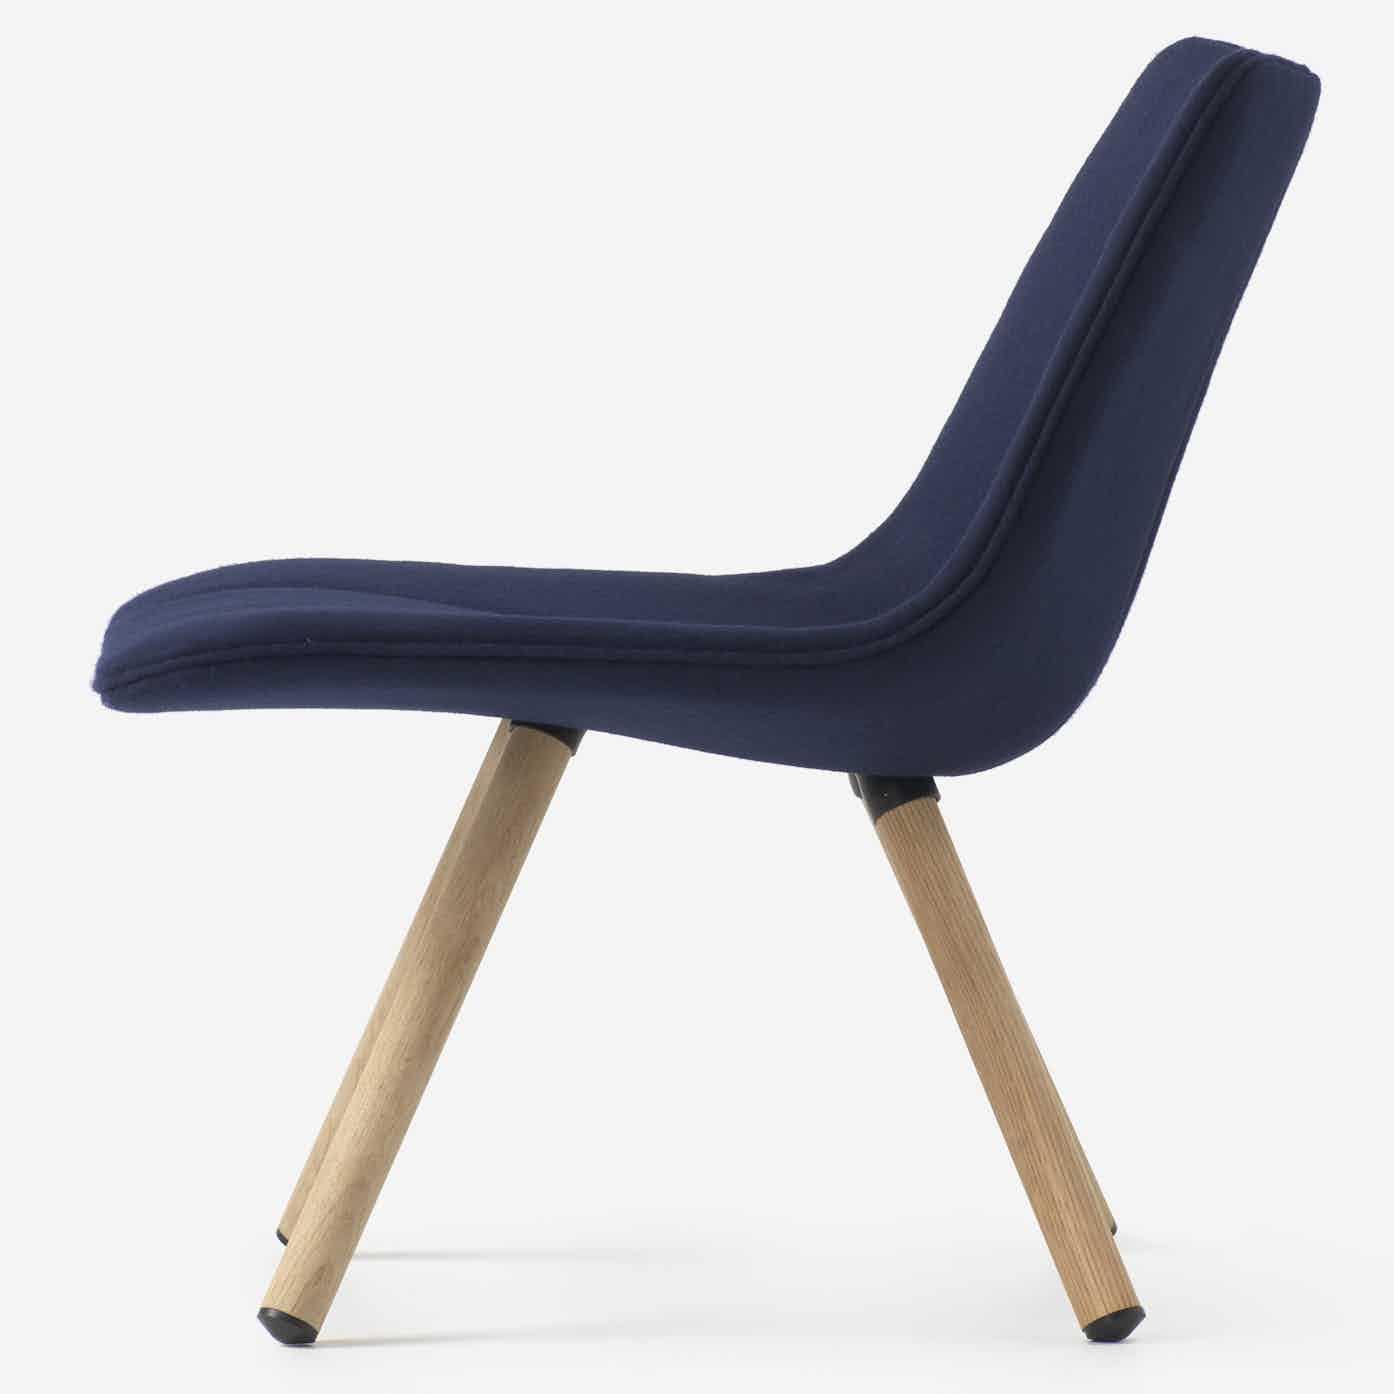 Resident-furniture-4-leg-volley-chair-navy-side-haute-living